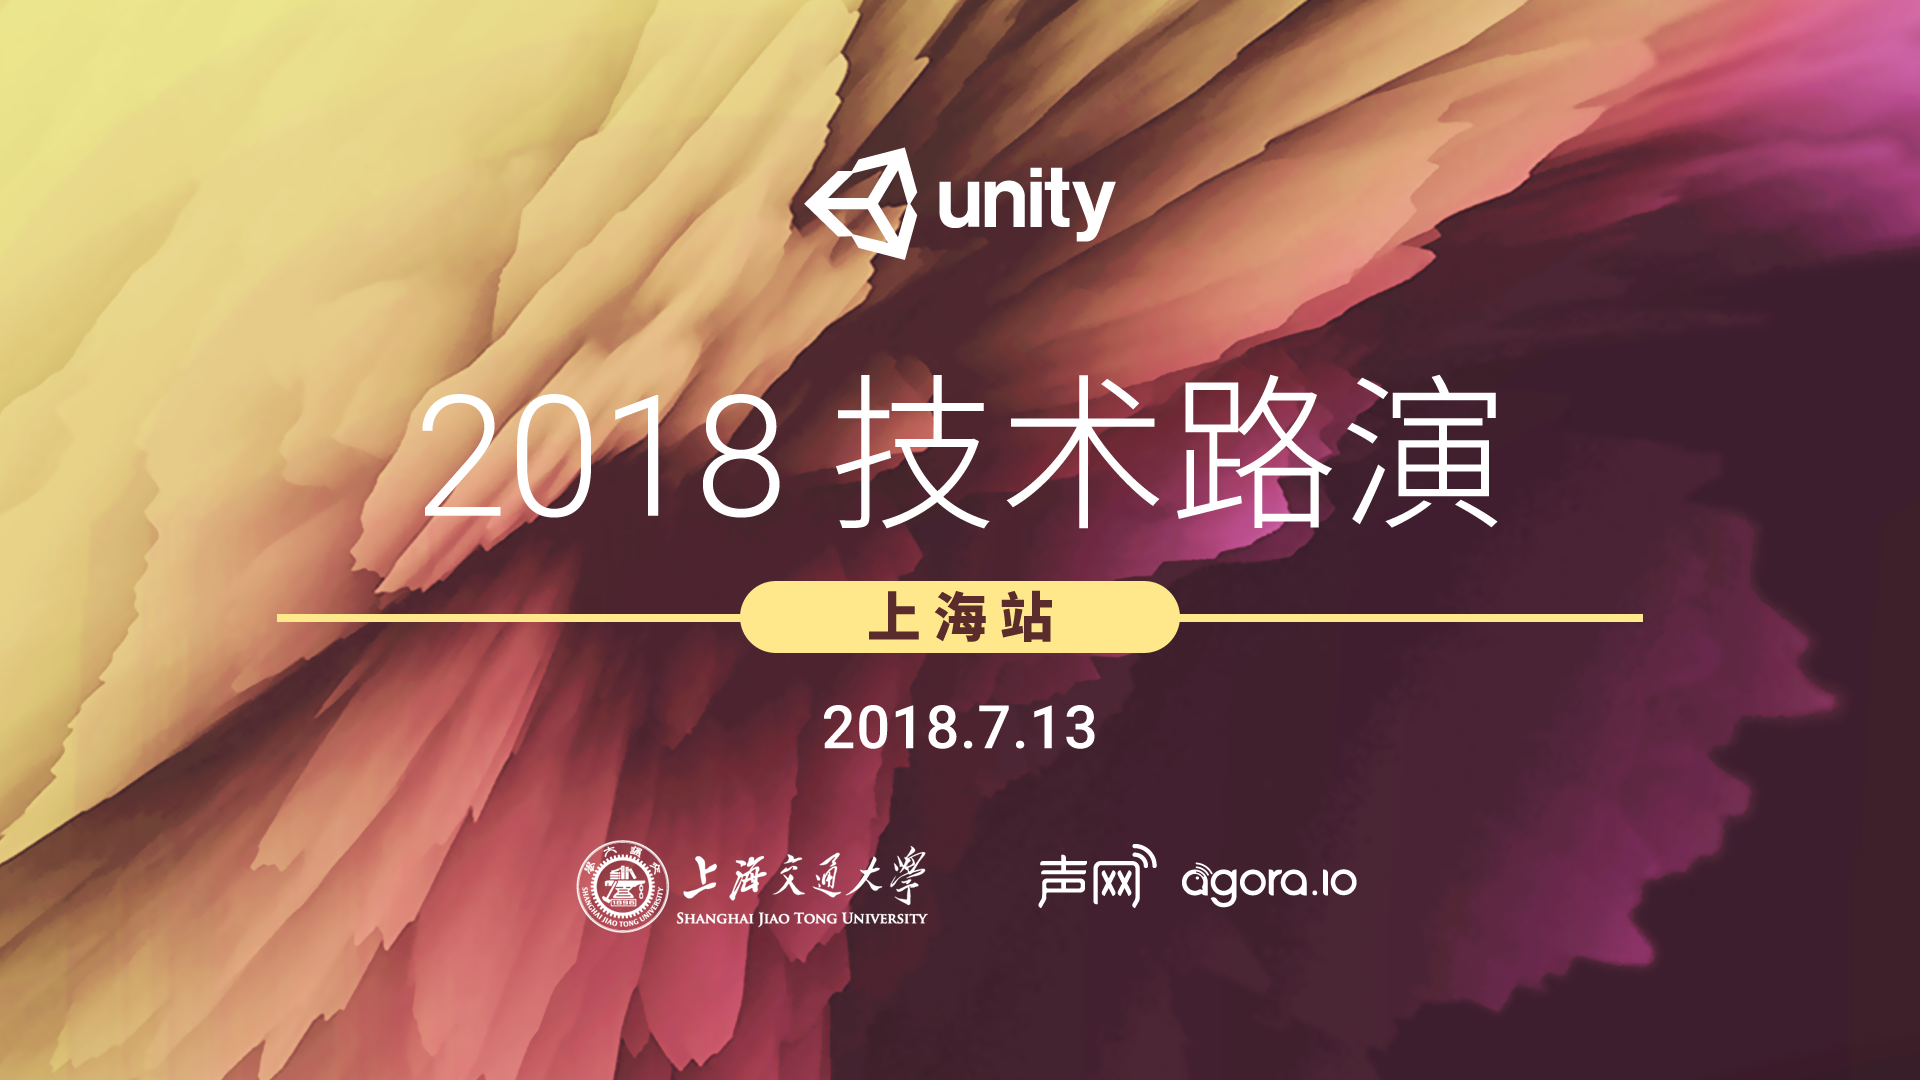 2018 Unity技术路演 上海站报名正式启动